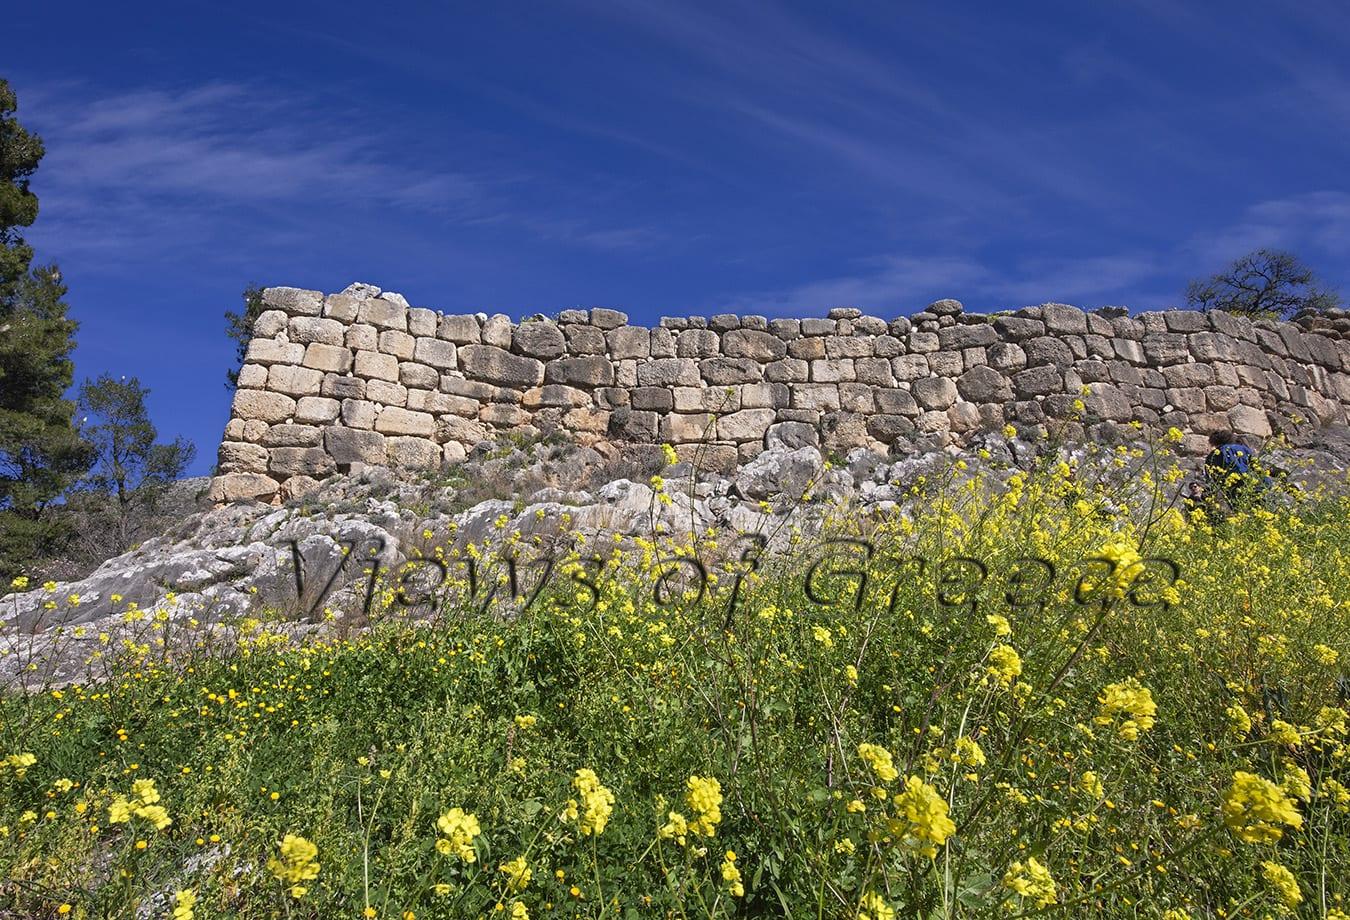 Ancient Nemea, Mycenae, ancient Korinthos, Peloponnese, museum, greece, archaeological, historic, history, archaeology, Αρχαία Νεμέα, Μυκήνες, Αρχαία Κόρινθος, μονοήμερη εκδρομή, Οινοποιεία, Δίας, νομός Κορινθίας, νομός Αργολίδας, Πελοπόννησος, Αρχαιολογικοί χώροι, δρόμοι κρασιού